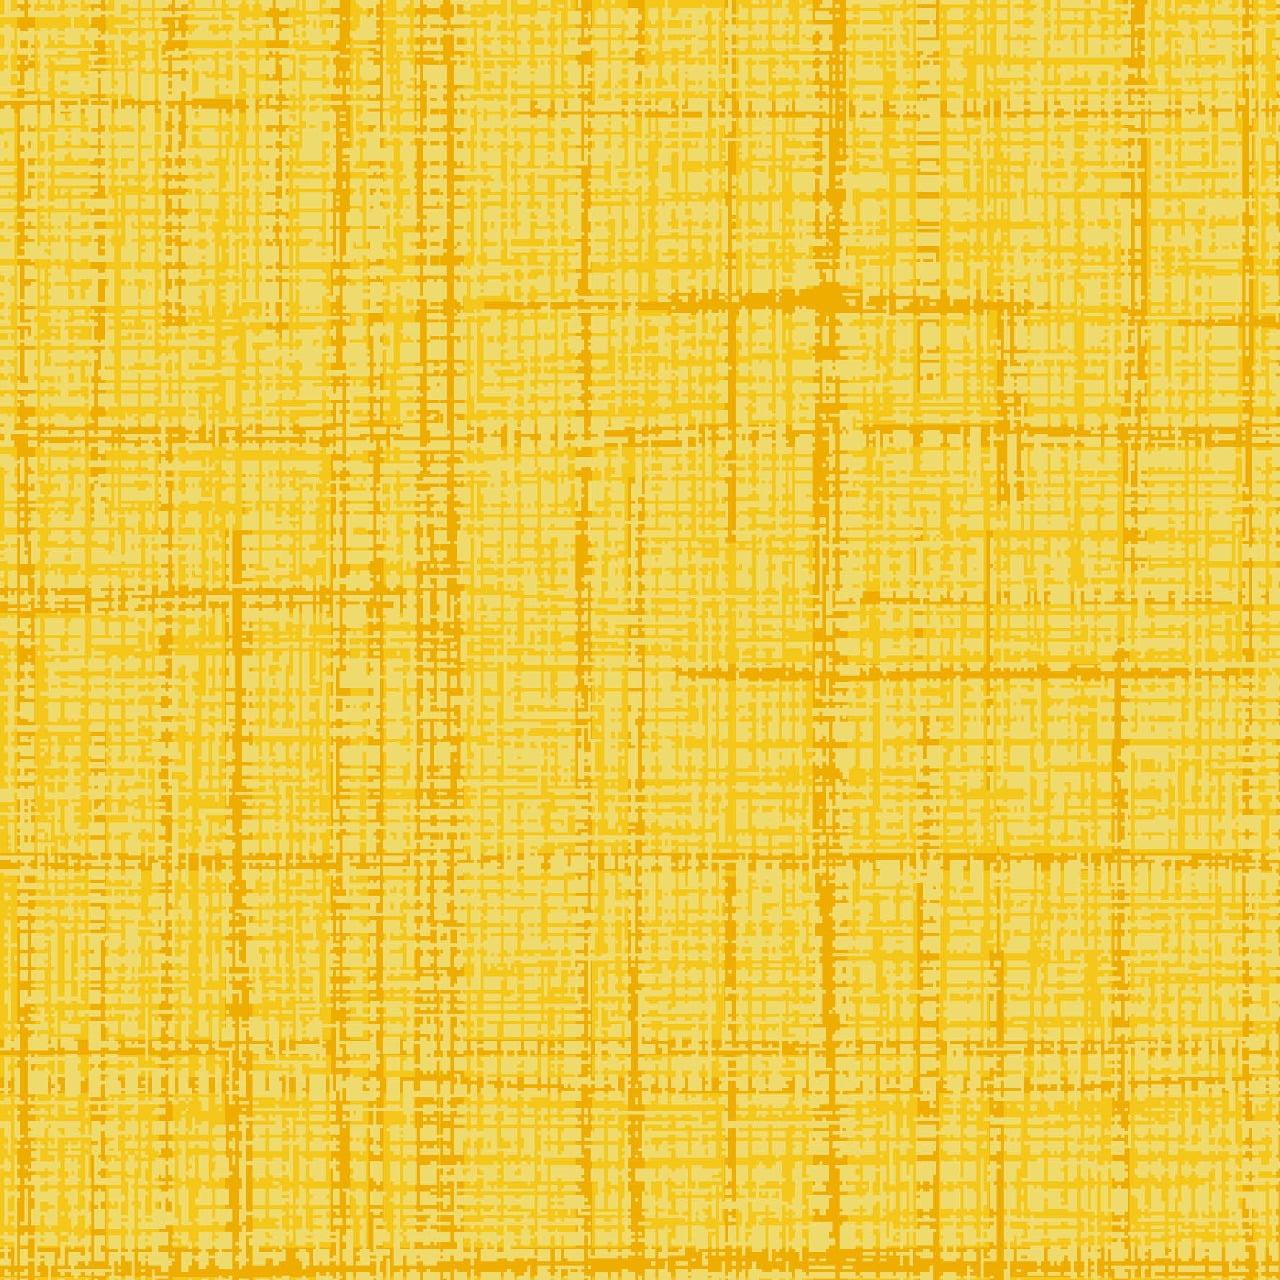 Textura amarelo neon